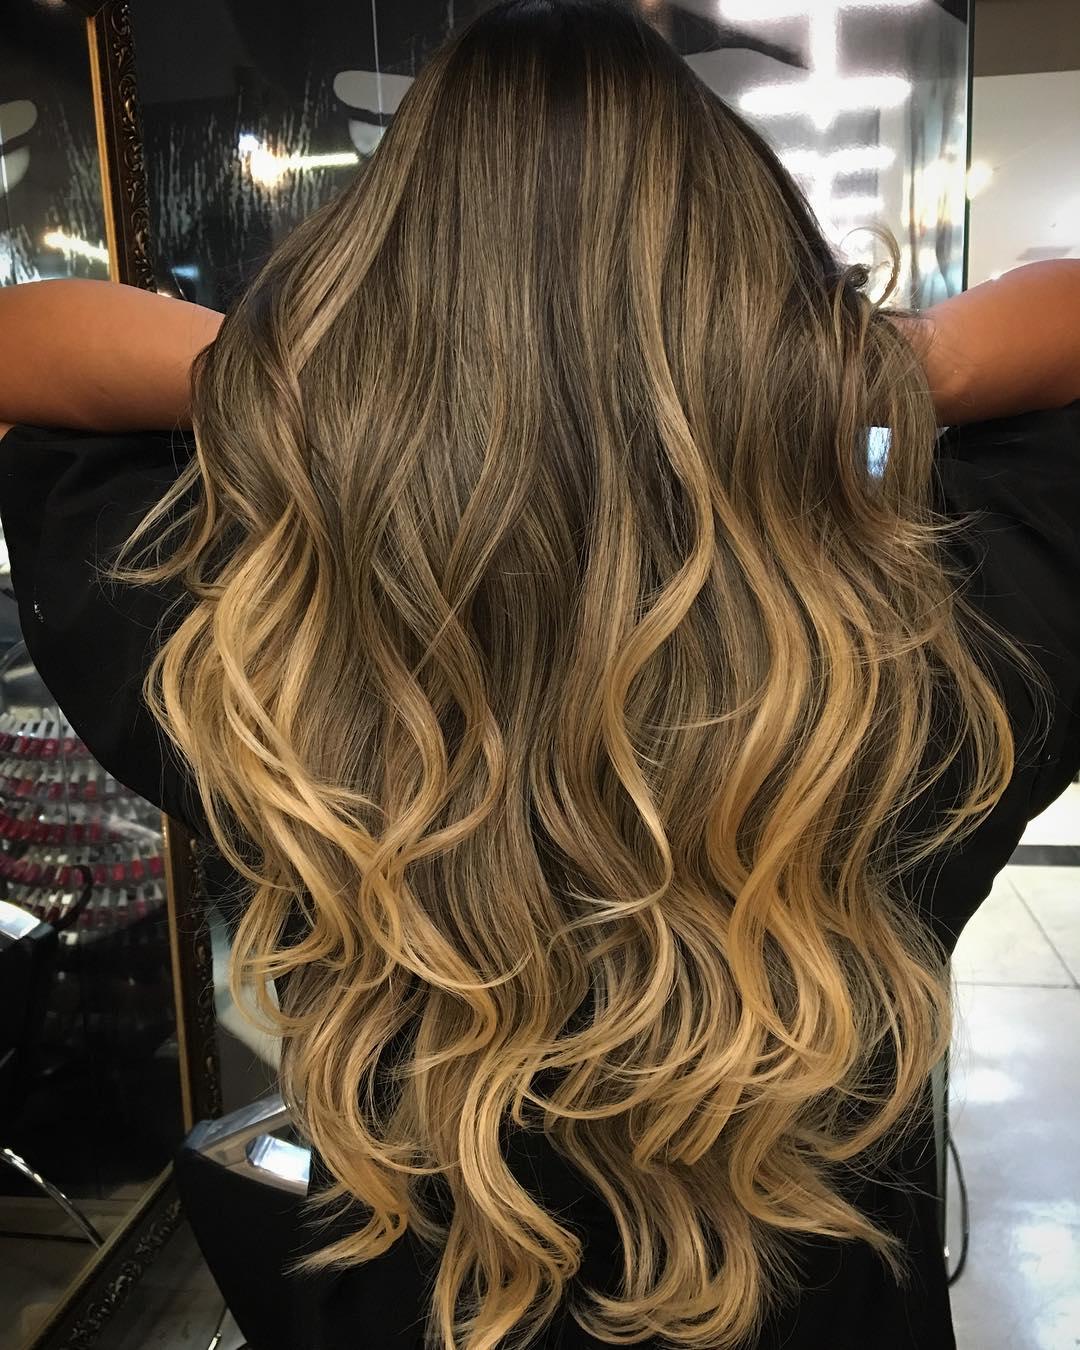 Dark Hair With Light Blonde Highlights